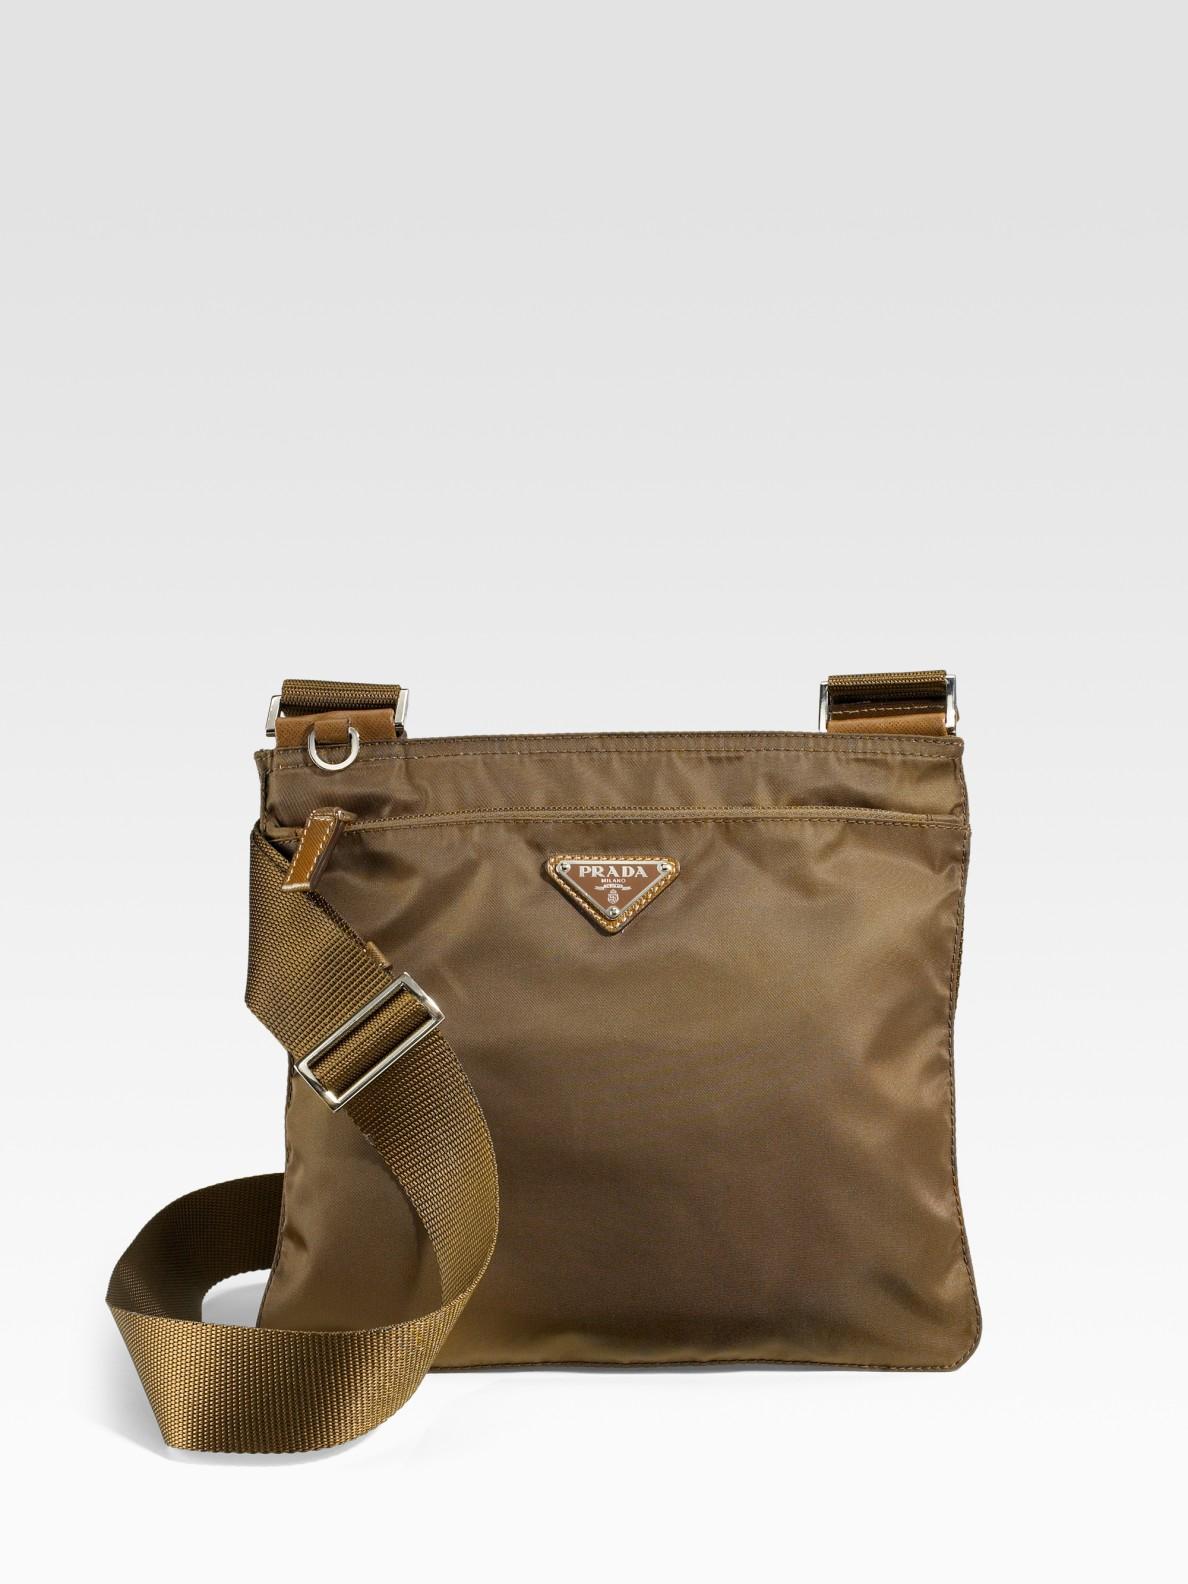 b015a231e04a Prada Messenger Bag Nylon Brown | Stanford Center for Opportunity ...